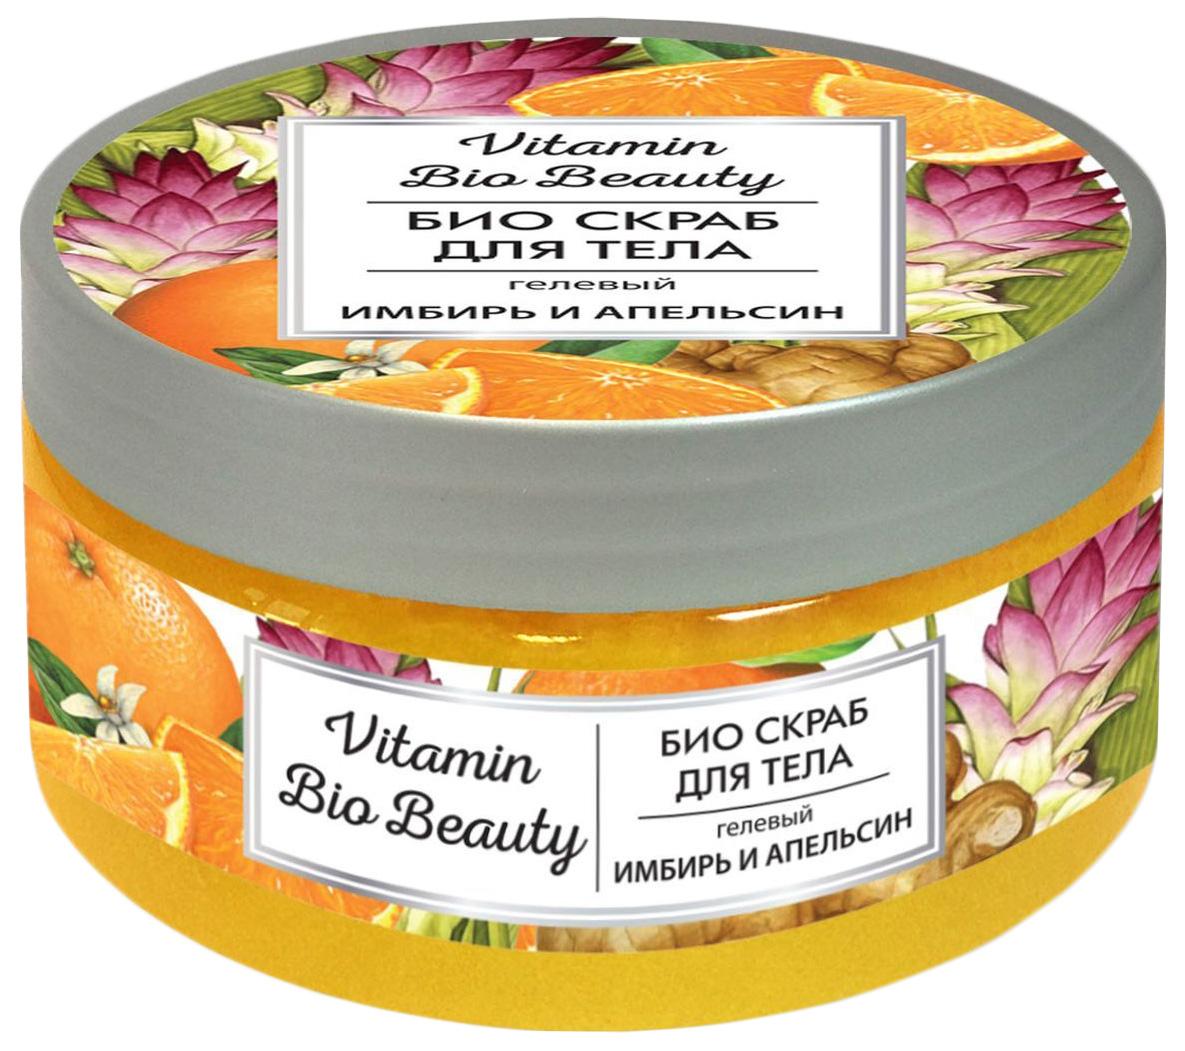 Скраб для тела Vitamin Bio Beauty Имбирь и апельсин гелевый 250 мл